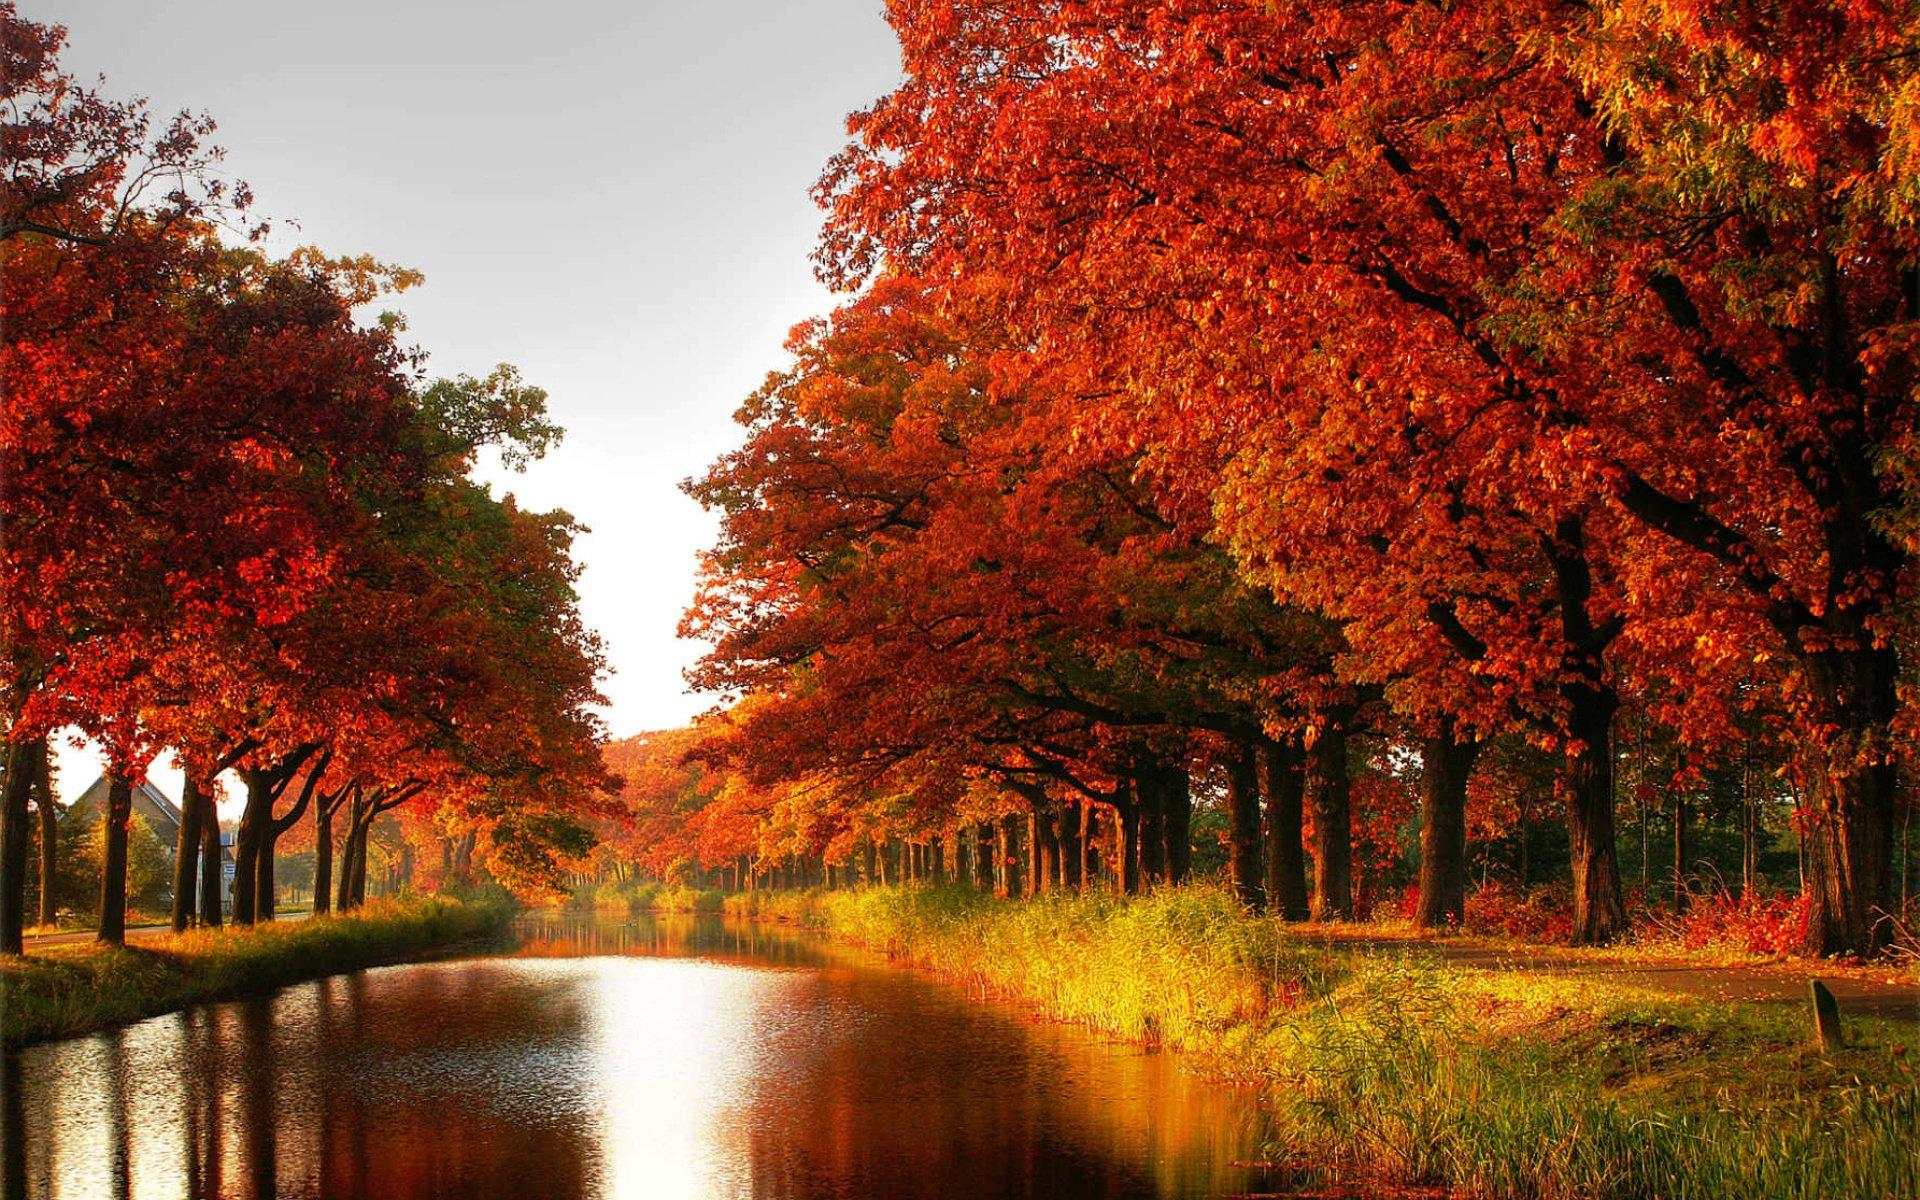 Autumn Colors wallpaper 1920x1200 317464 WallpaperUP 1920x1200